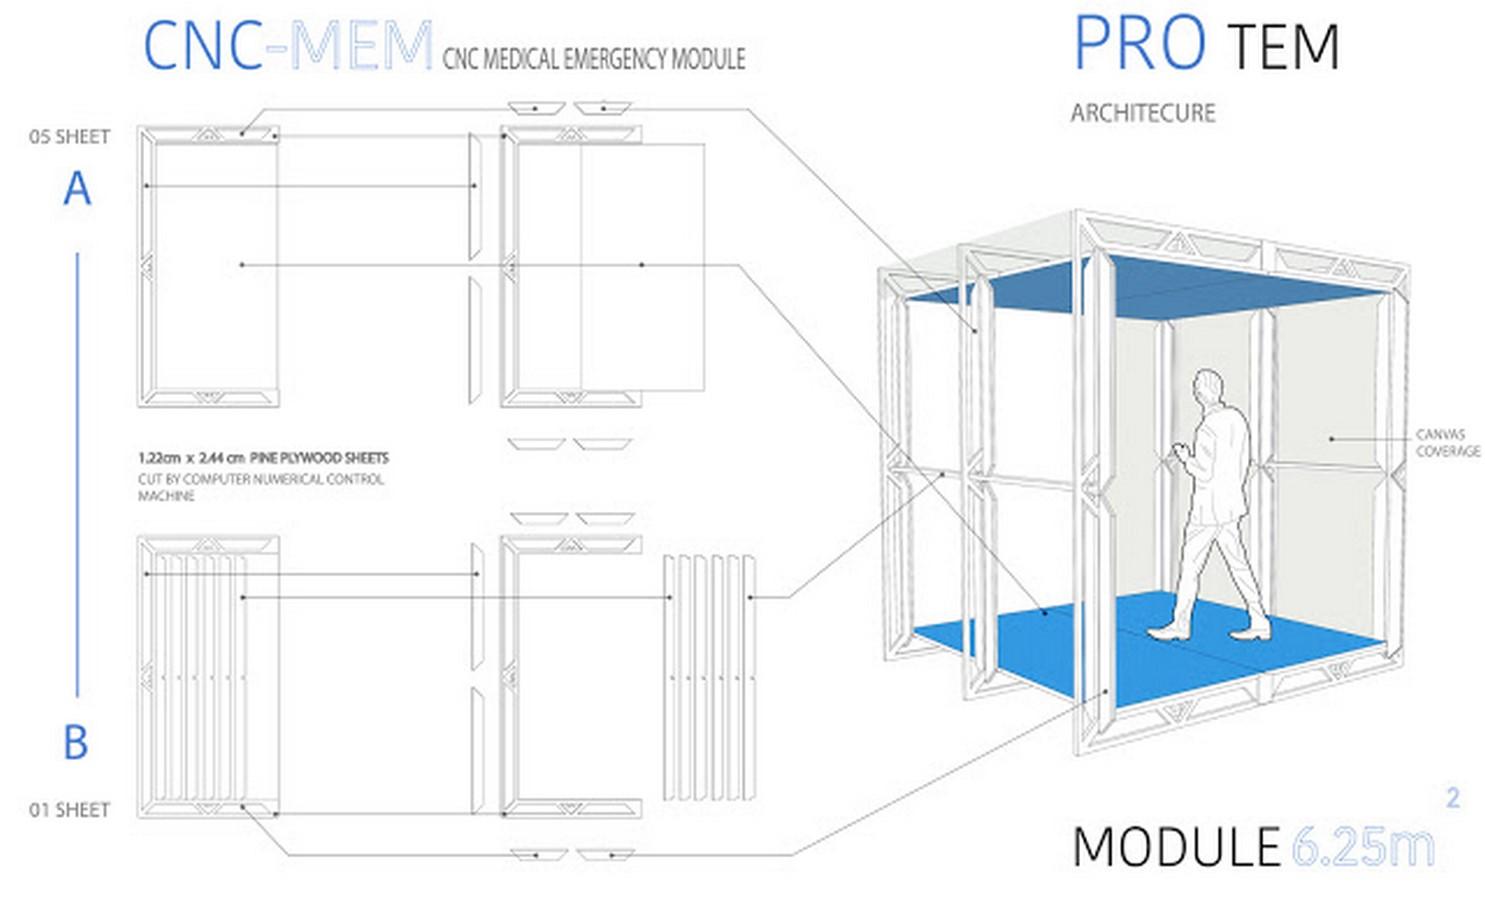 CNC Medical Emergency Module - Sheet2